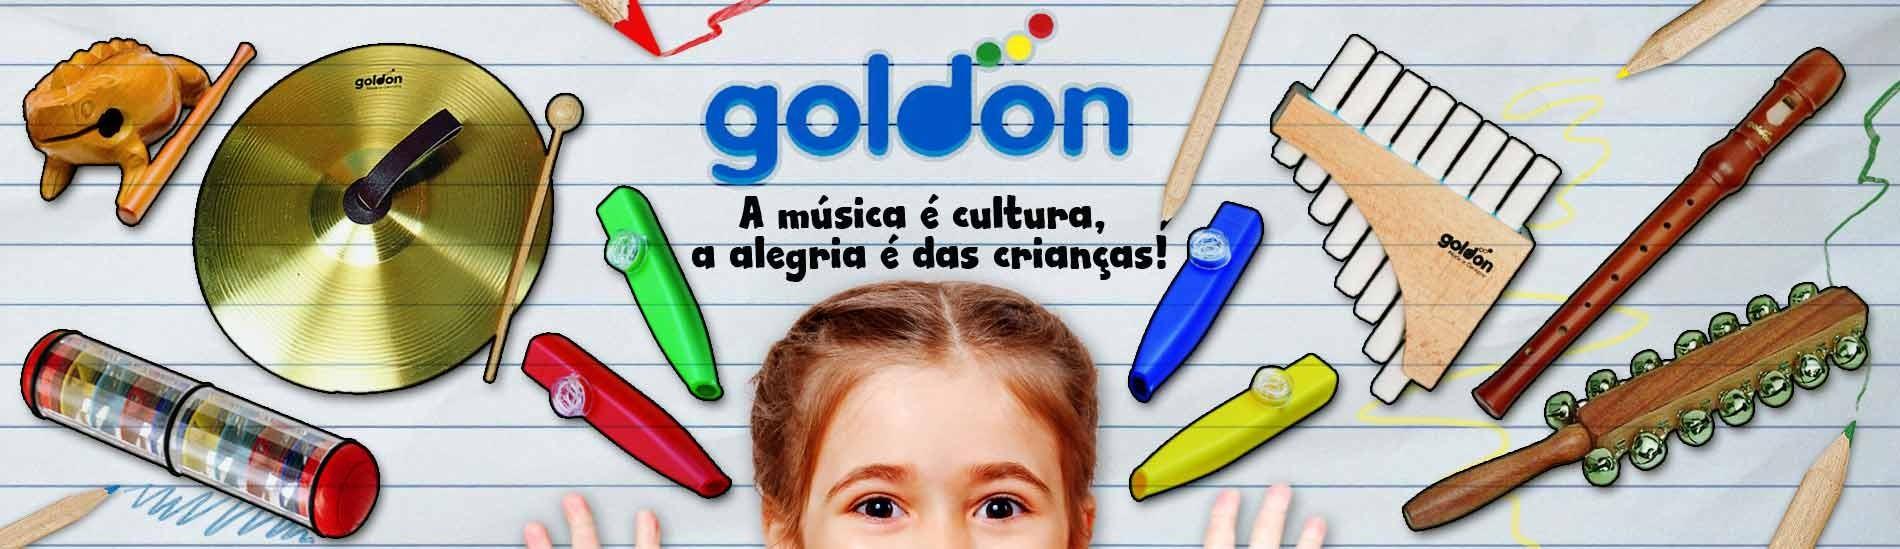 goldon-geral-portugues